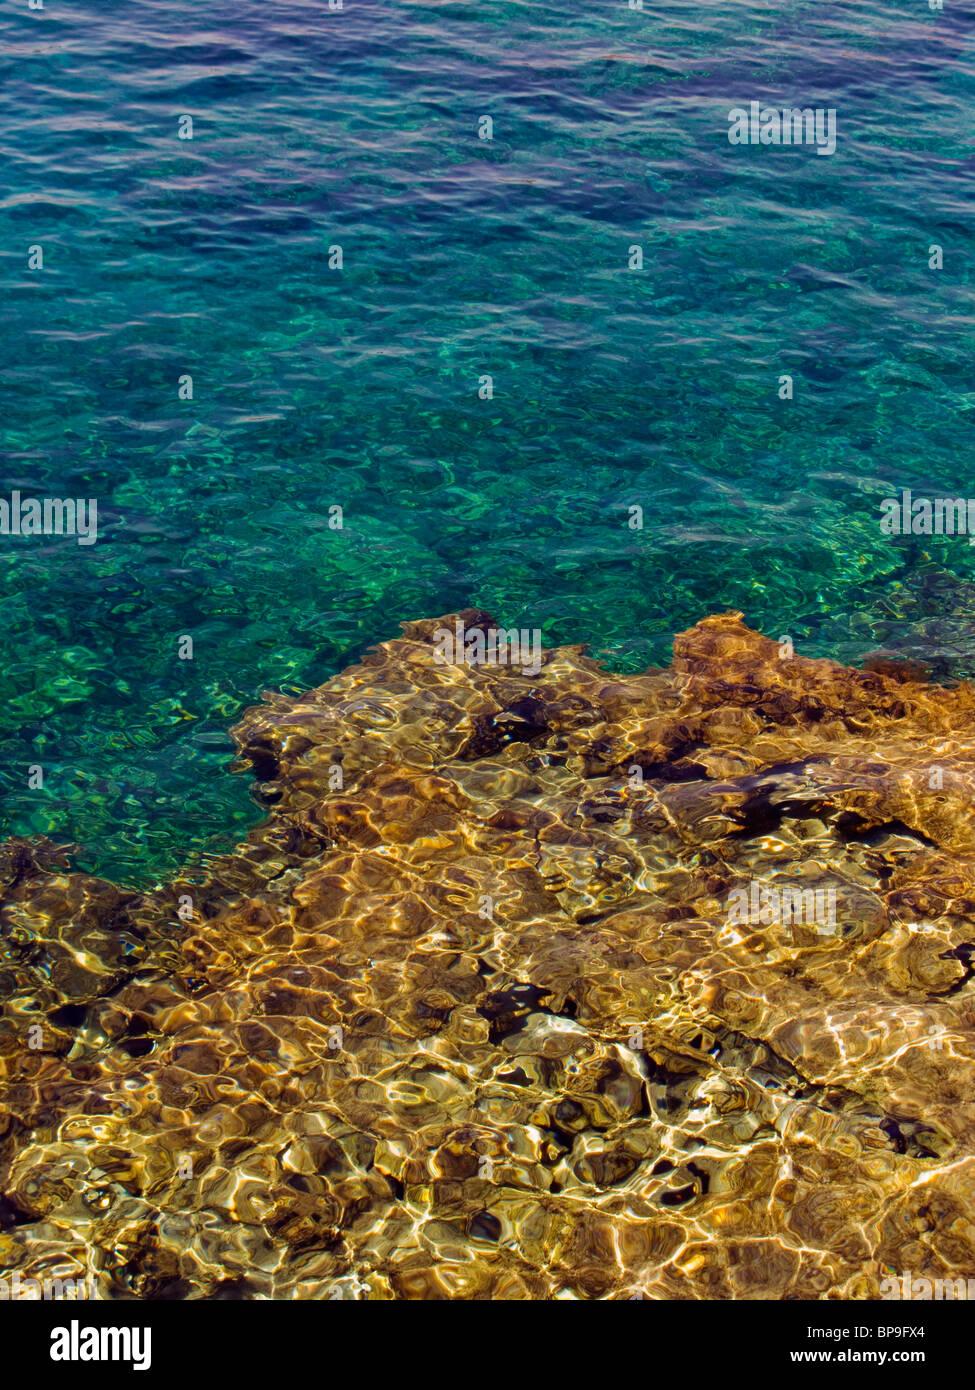 Rocks under water at Protaras, Cyprus, Europe. Stock Photo